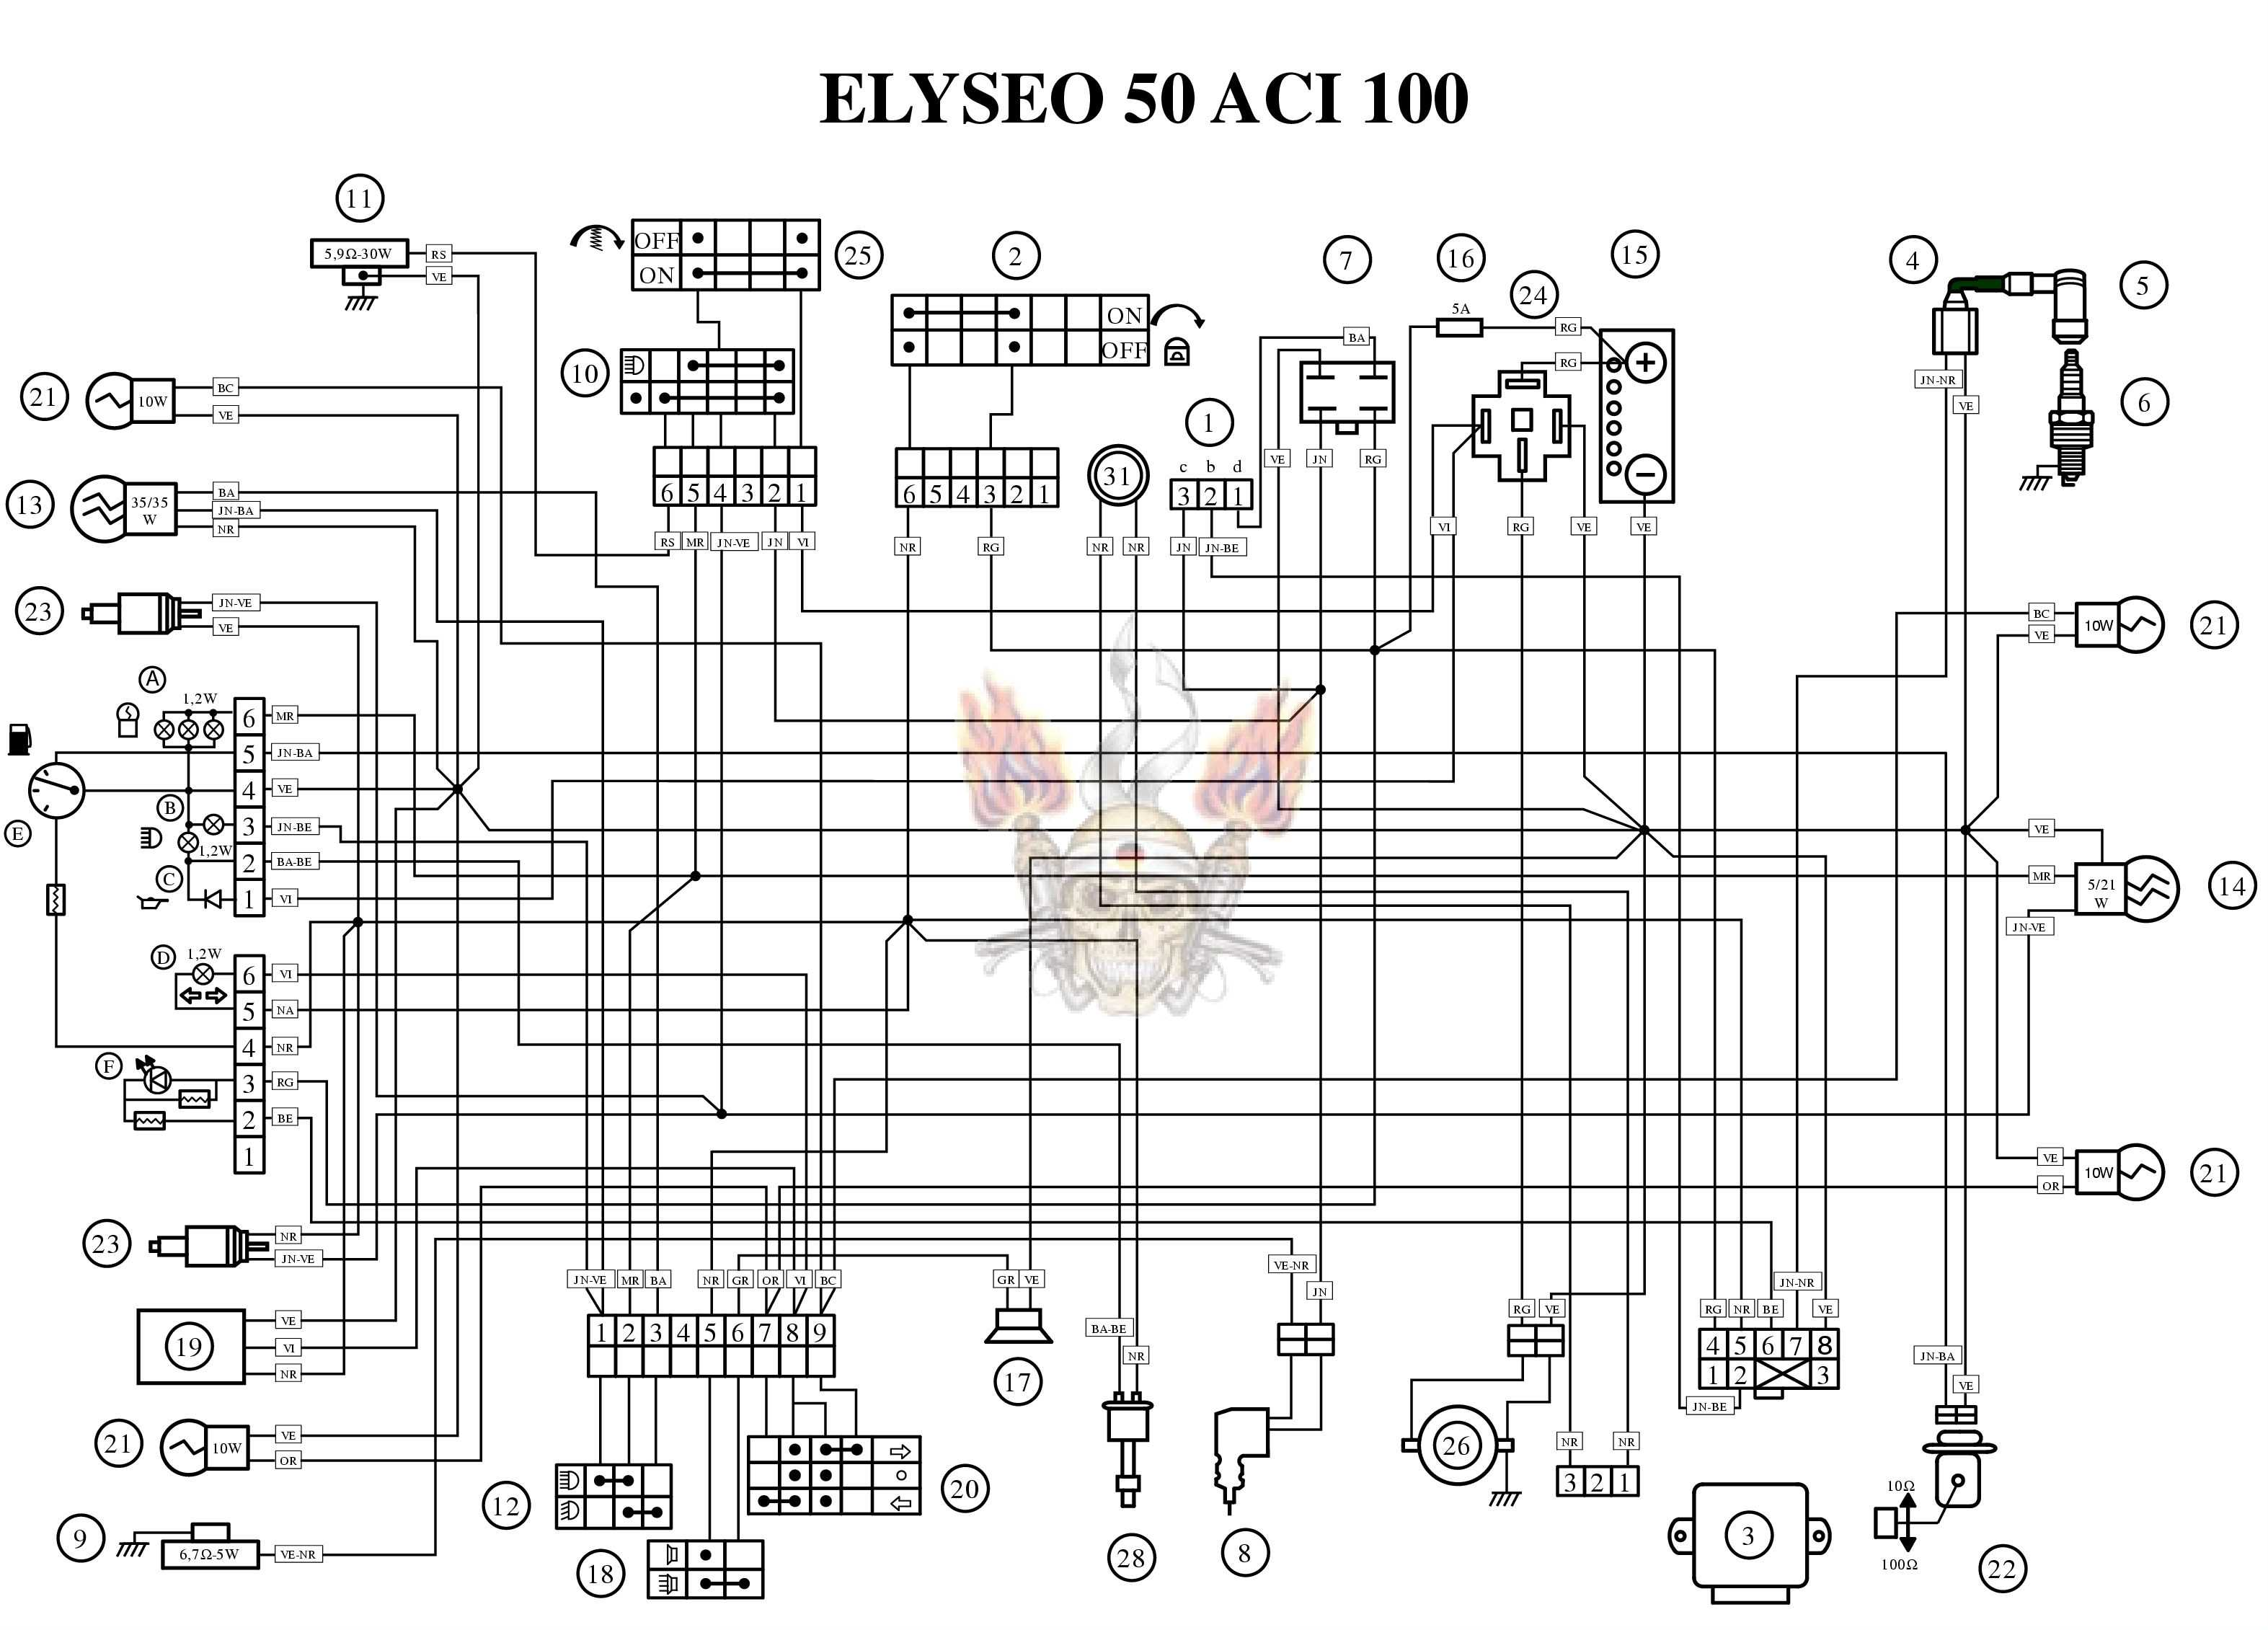 peugeot 406 wiring diagram wiring diagrams  peugeot 207 wiring diagram #14